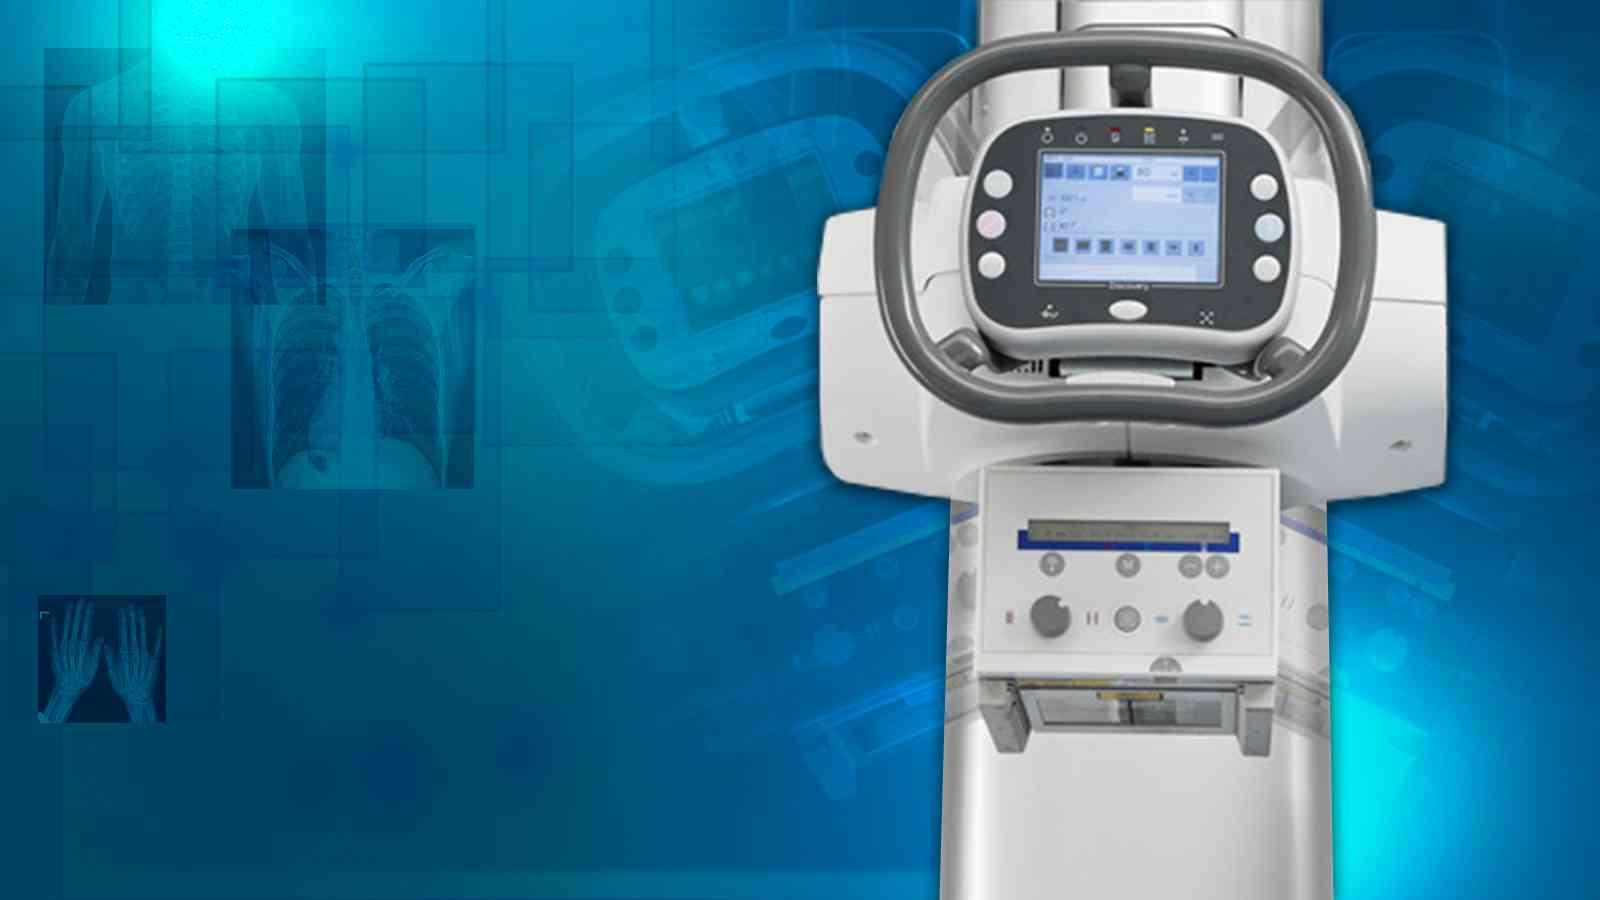 ACHILLES超声骨密度仪-工作站操作